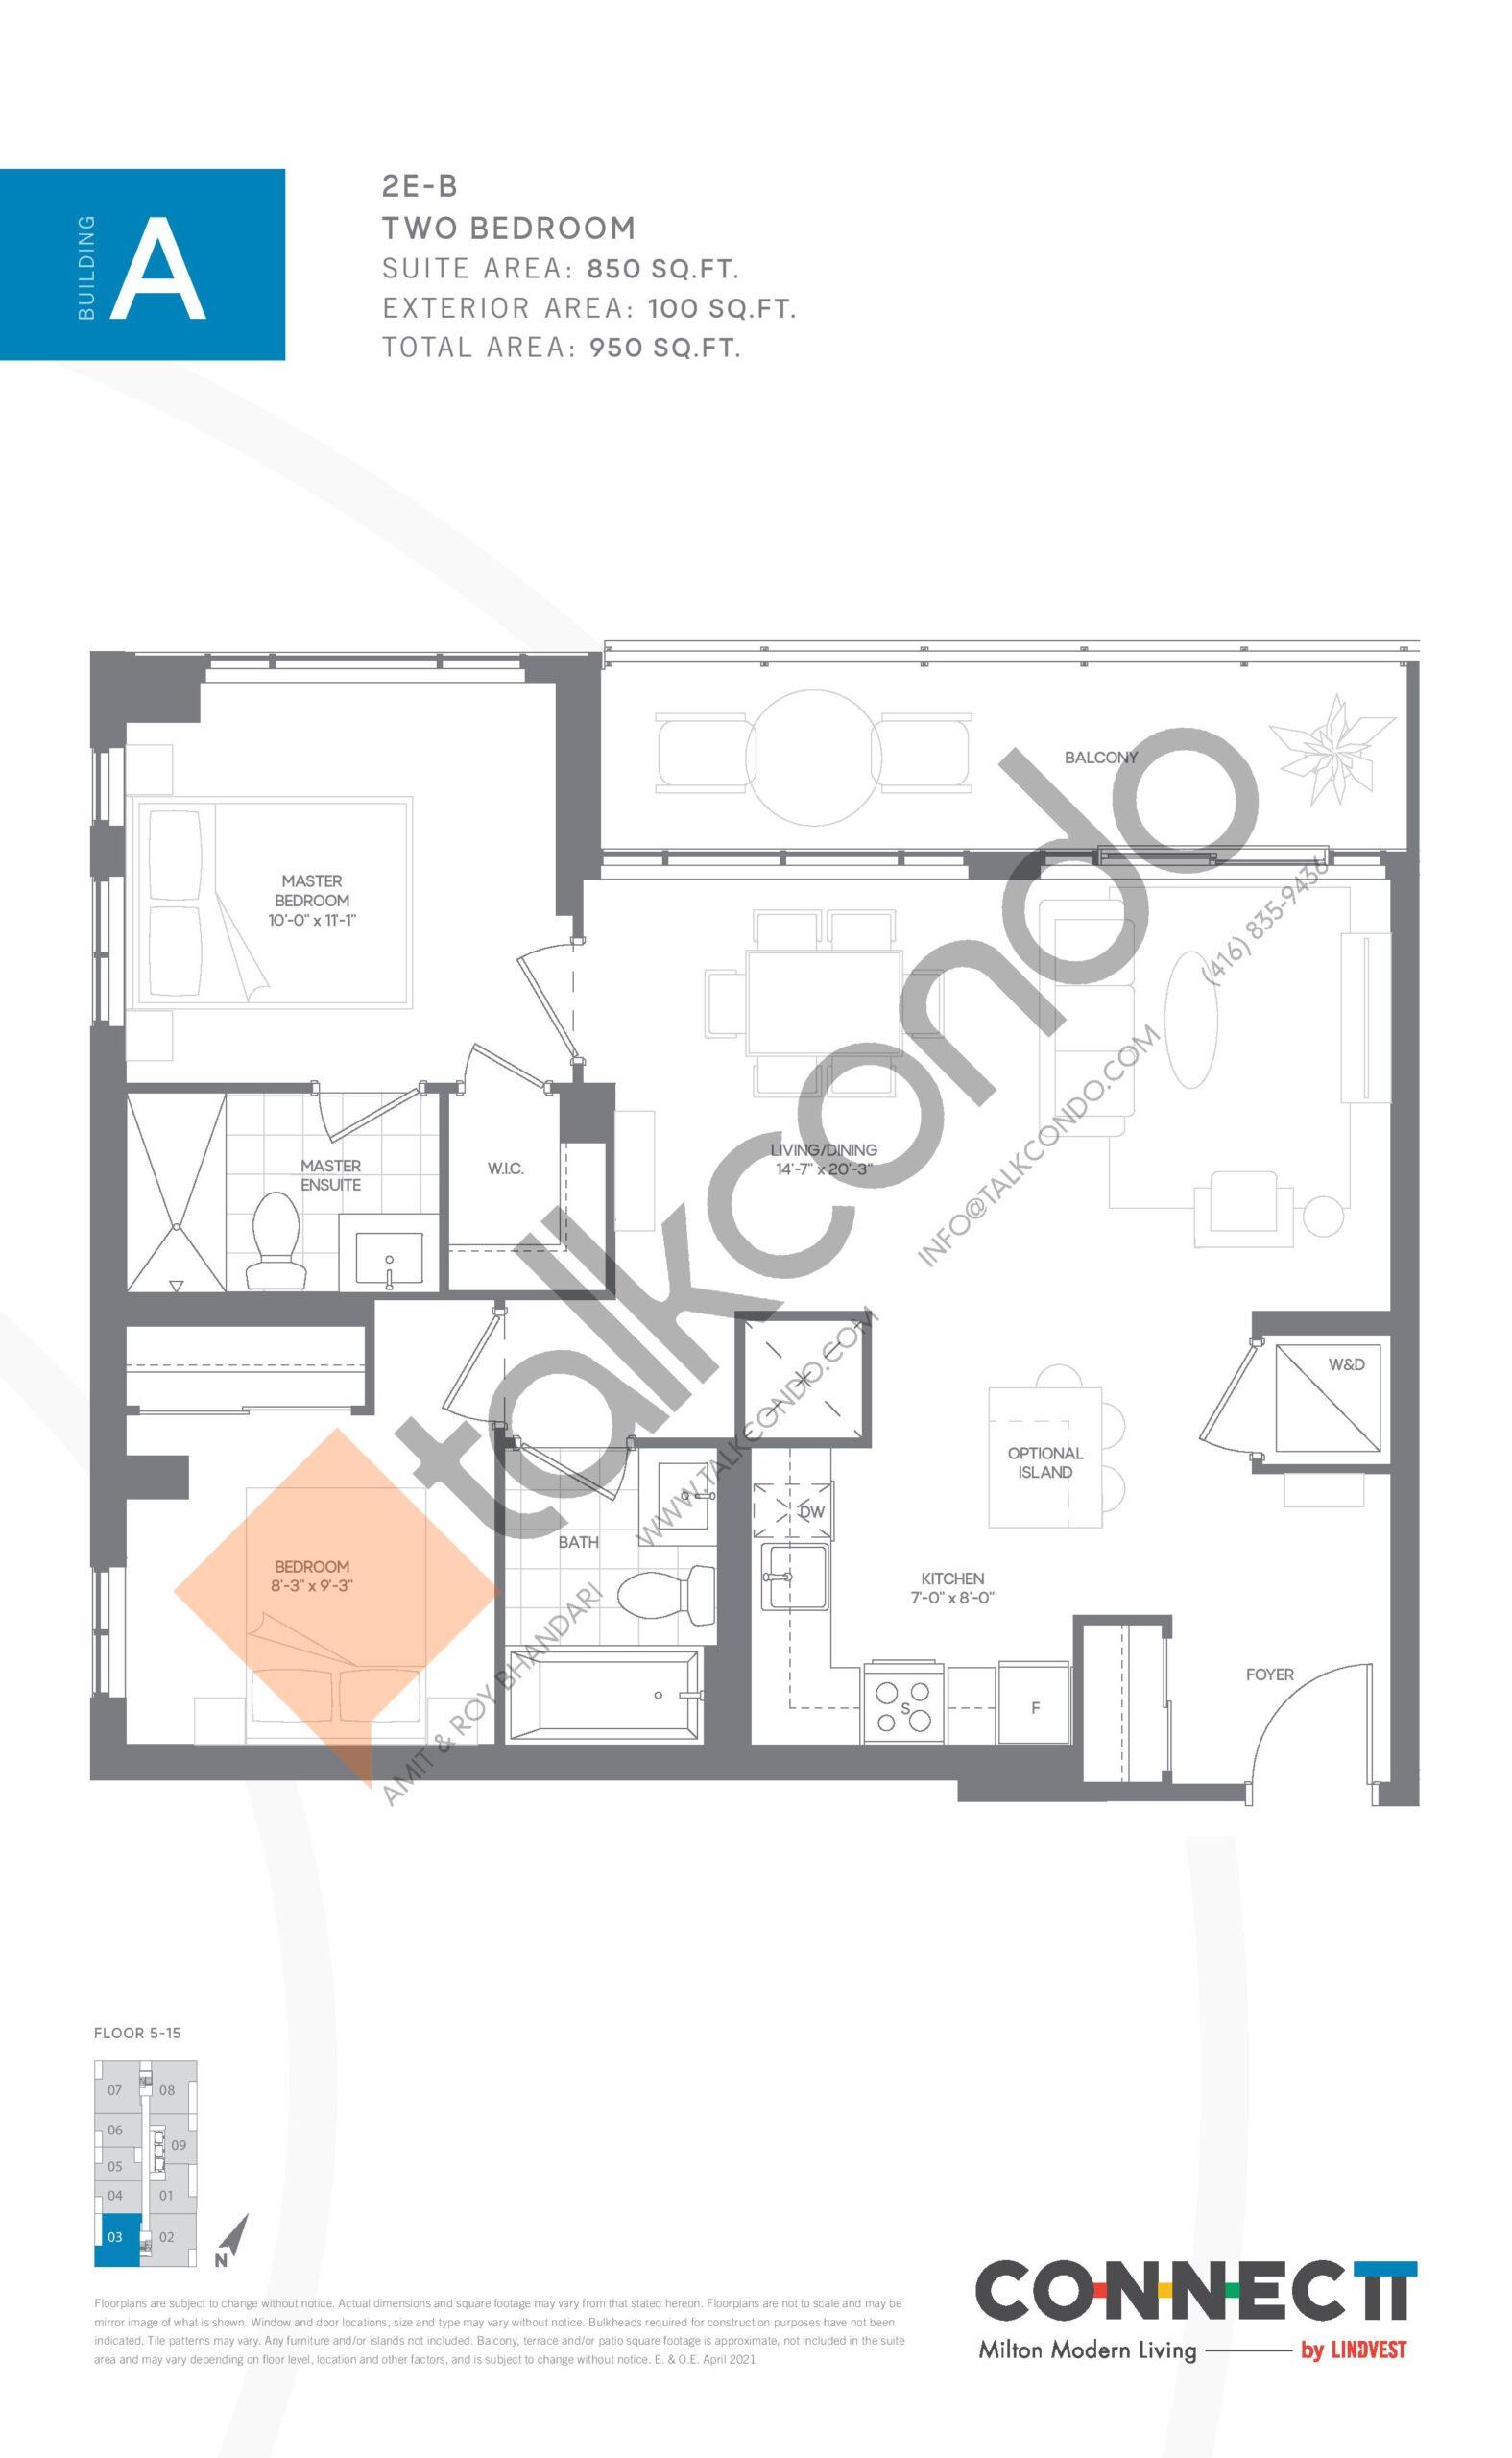 2E-B Floor Plan at Connectt Urban Community Condos - 850 sq.ft